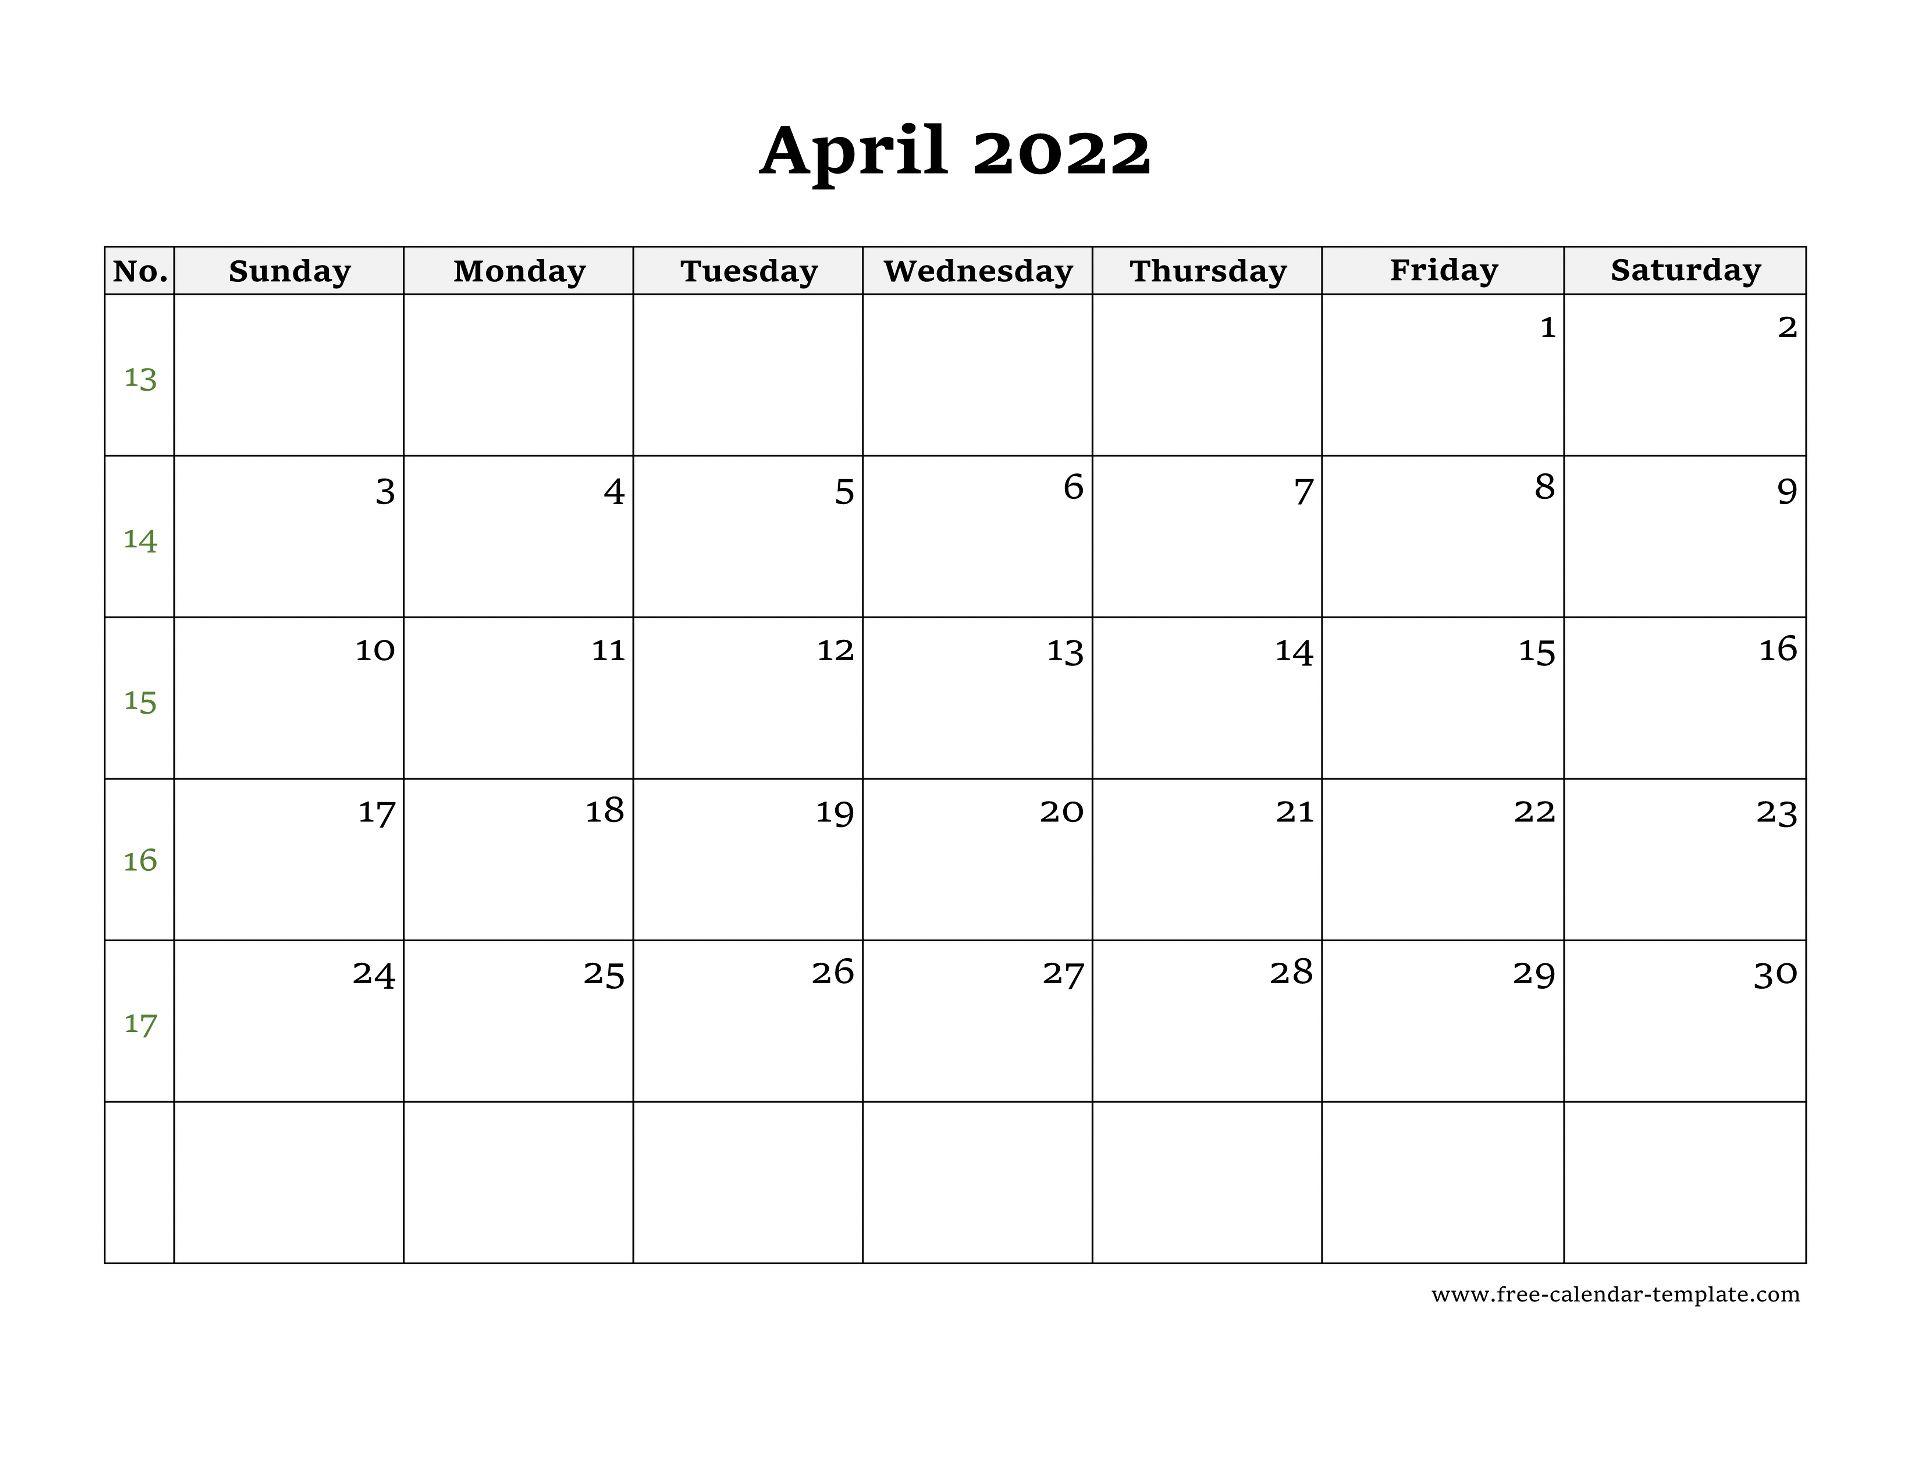 Apr 2022 Calendar.Simple April Calendar 2022 Large Box On Each Day For Notes Free Calendar Template Com